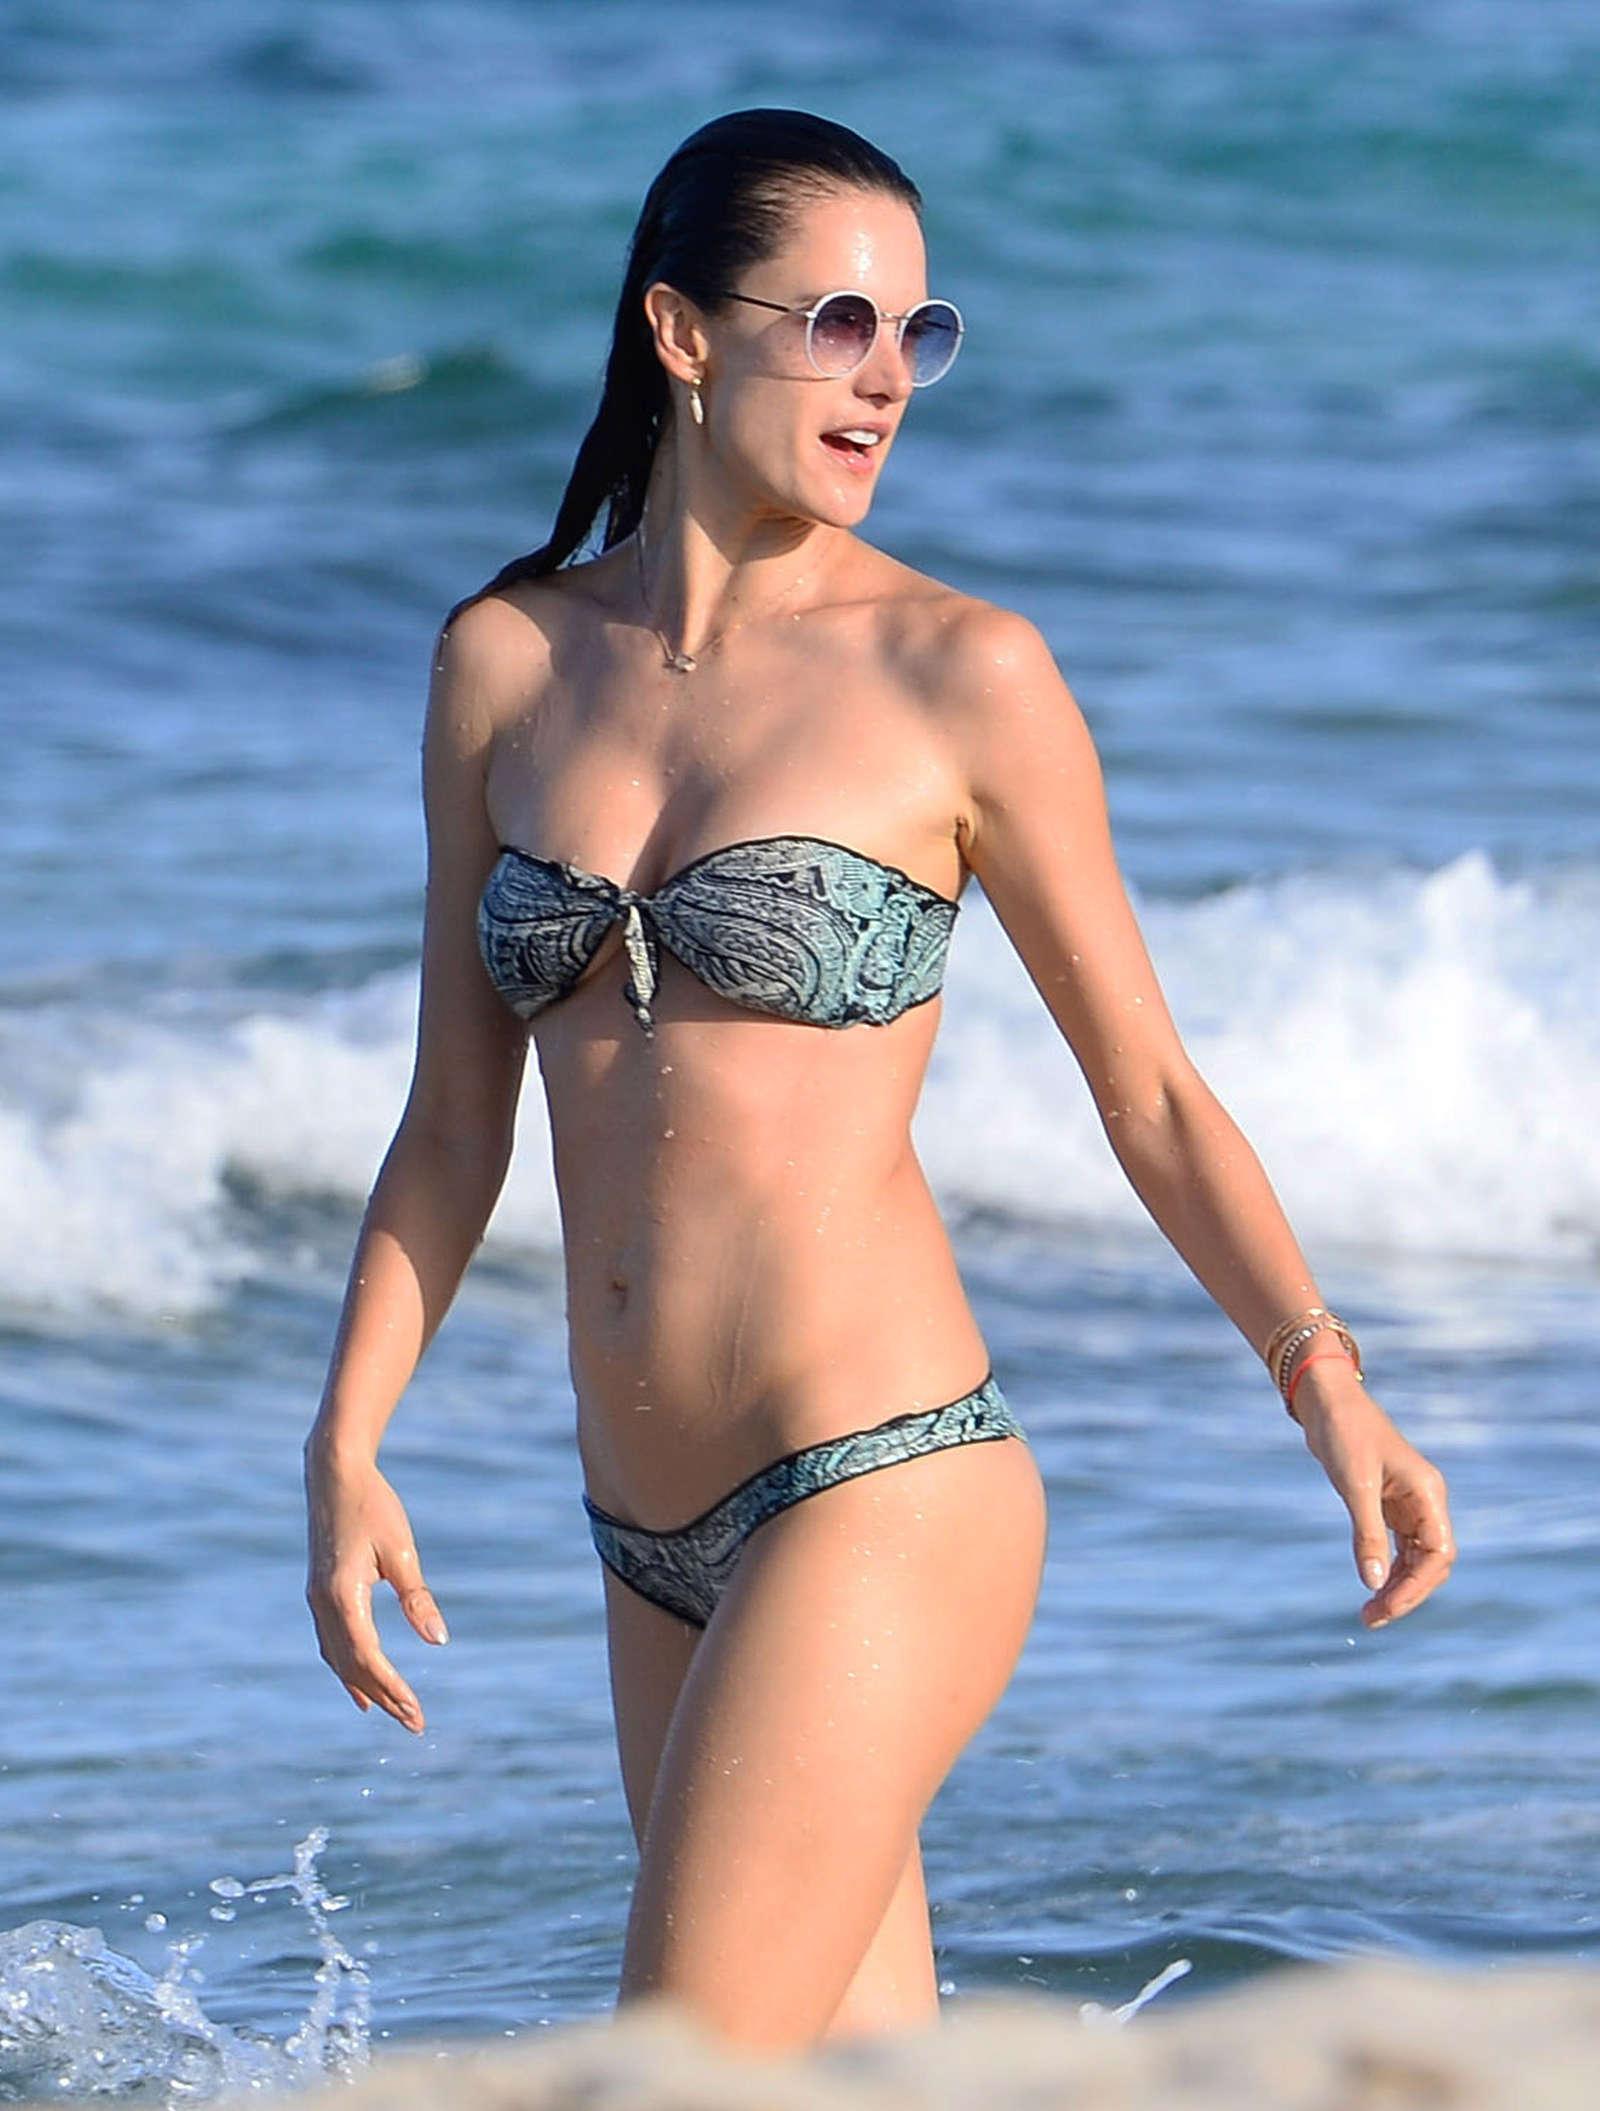 Alessandra Ambrosio in Bikini on the beach in Ibiza